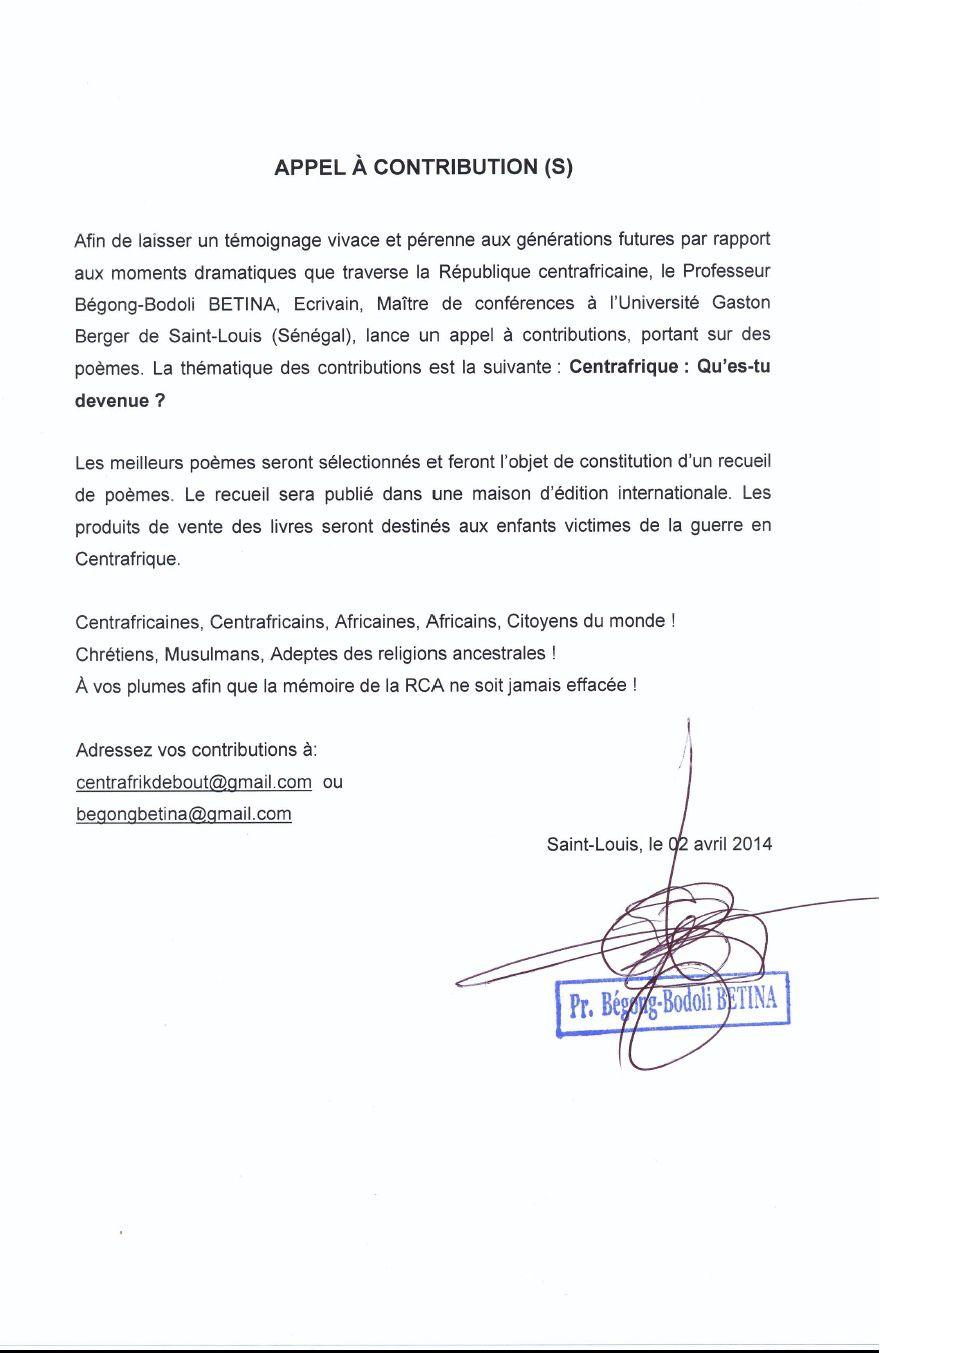 RCA: l'appel à contribution du Pr Betina à Dakar